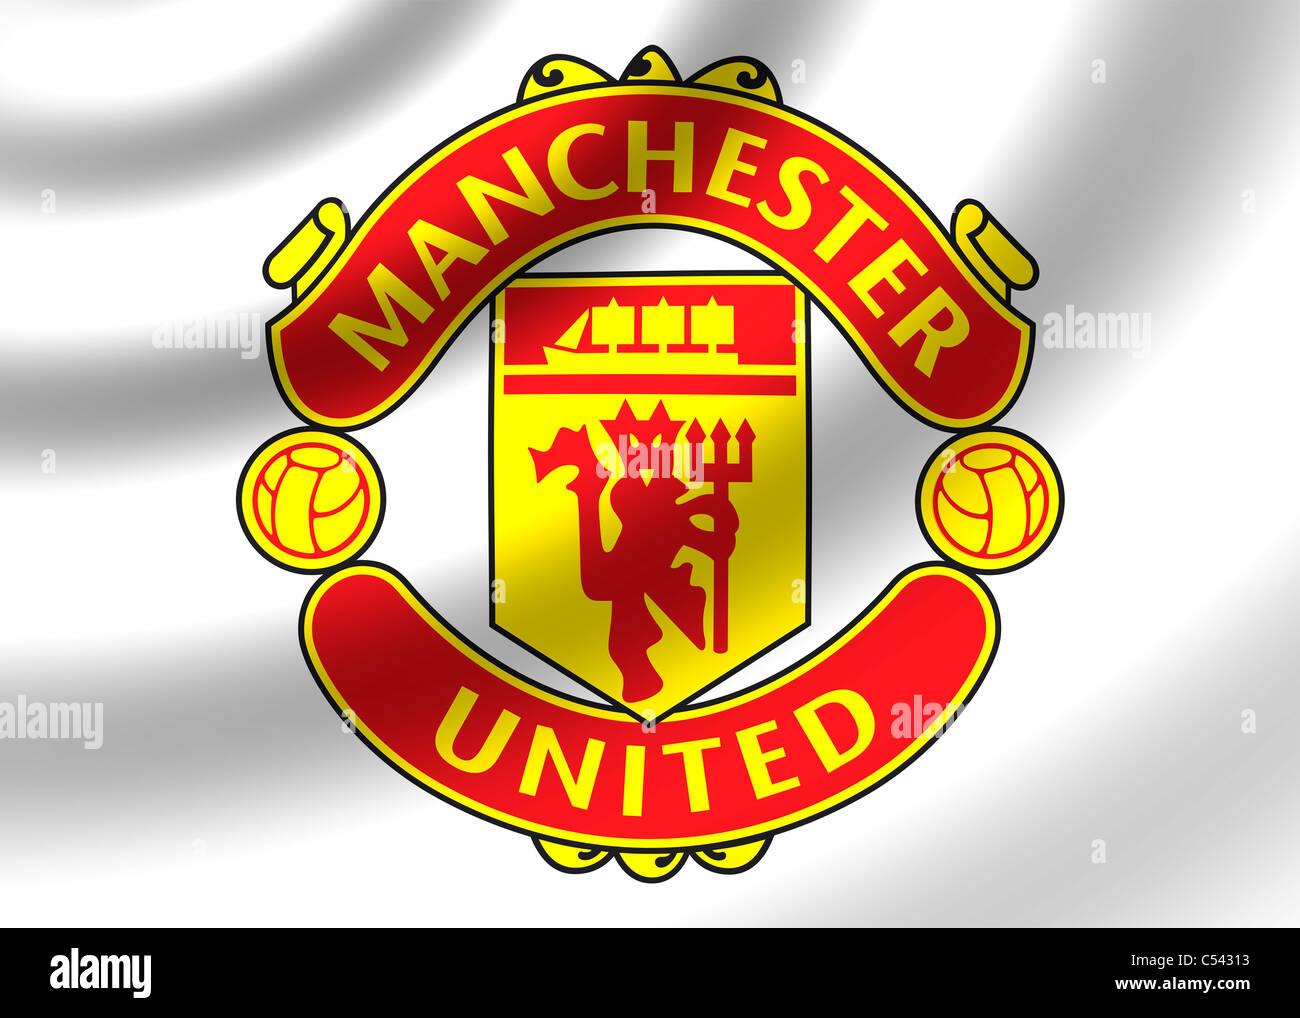 Manchester united flag logo symbol icon stock photo 37584207 alamy manchester united flag logo symbol icon voltagebd Images